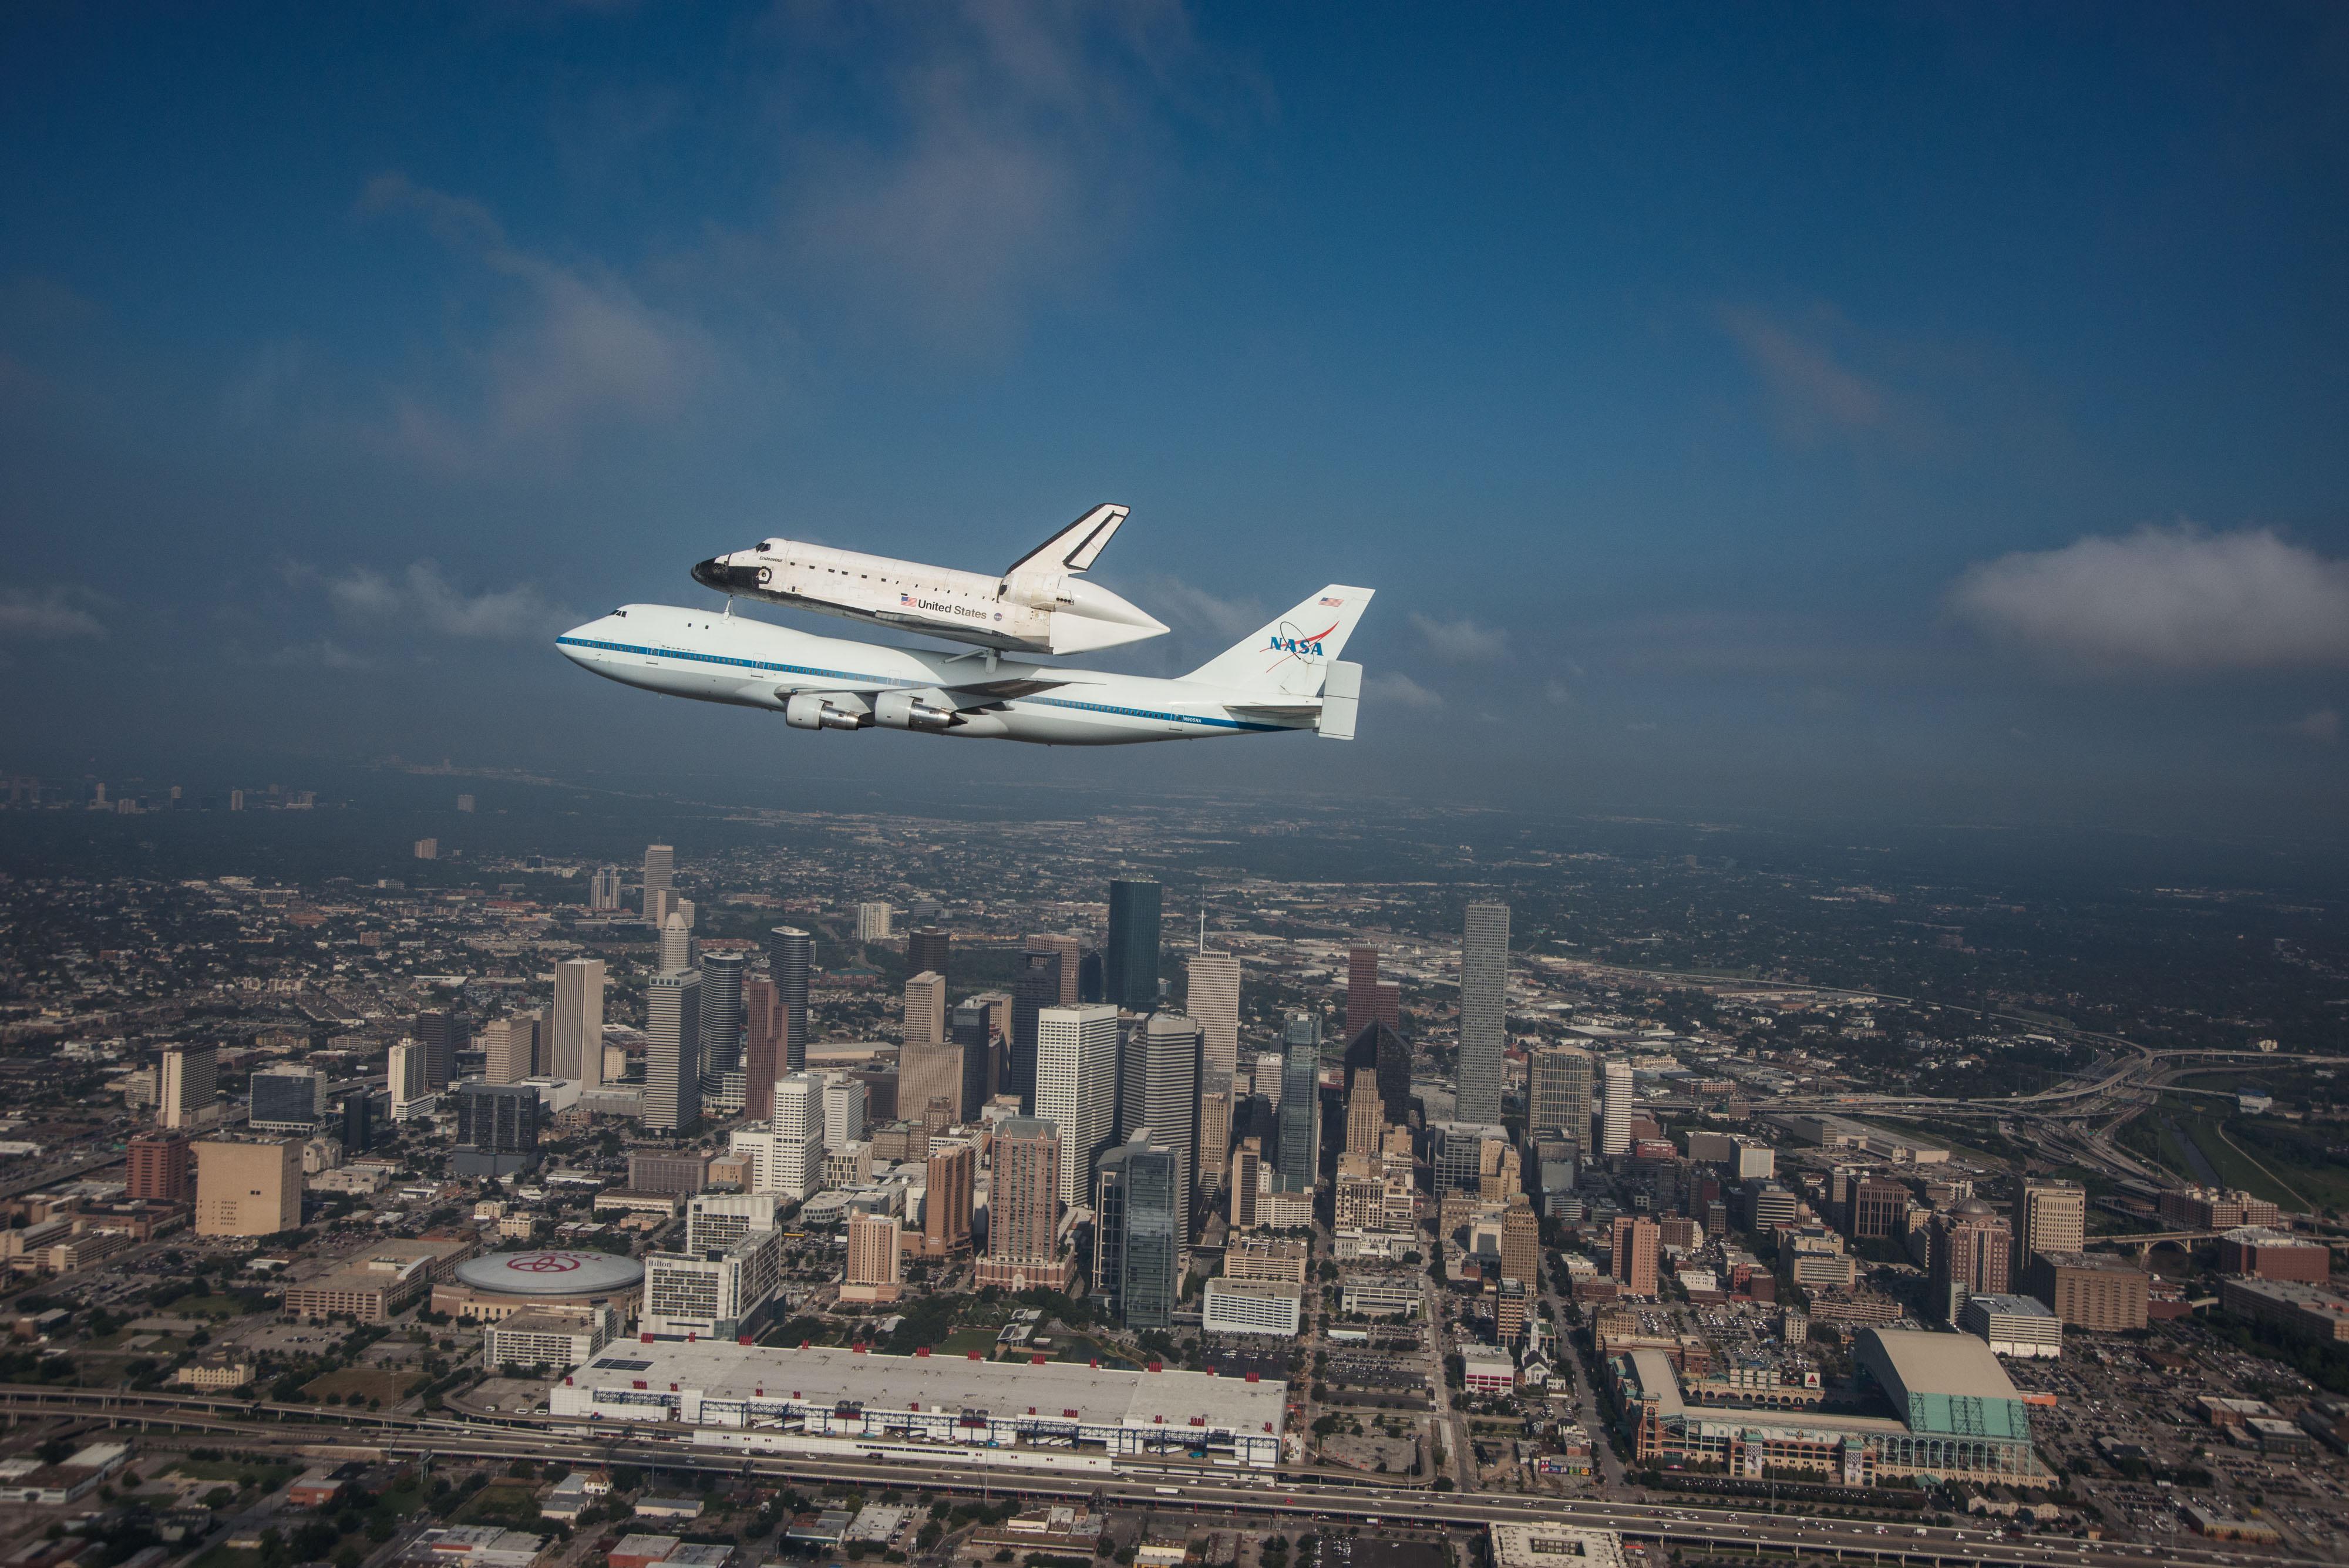 space shuttle endeavour nasa - photo #35